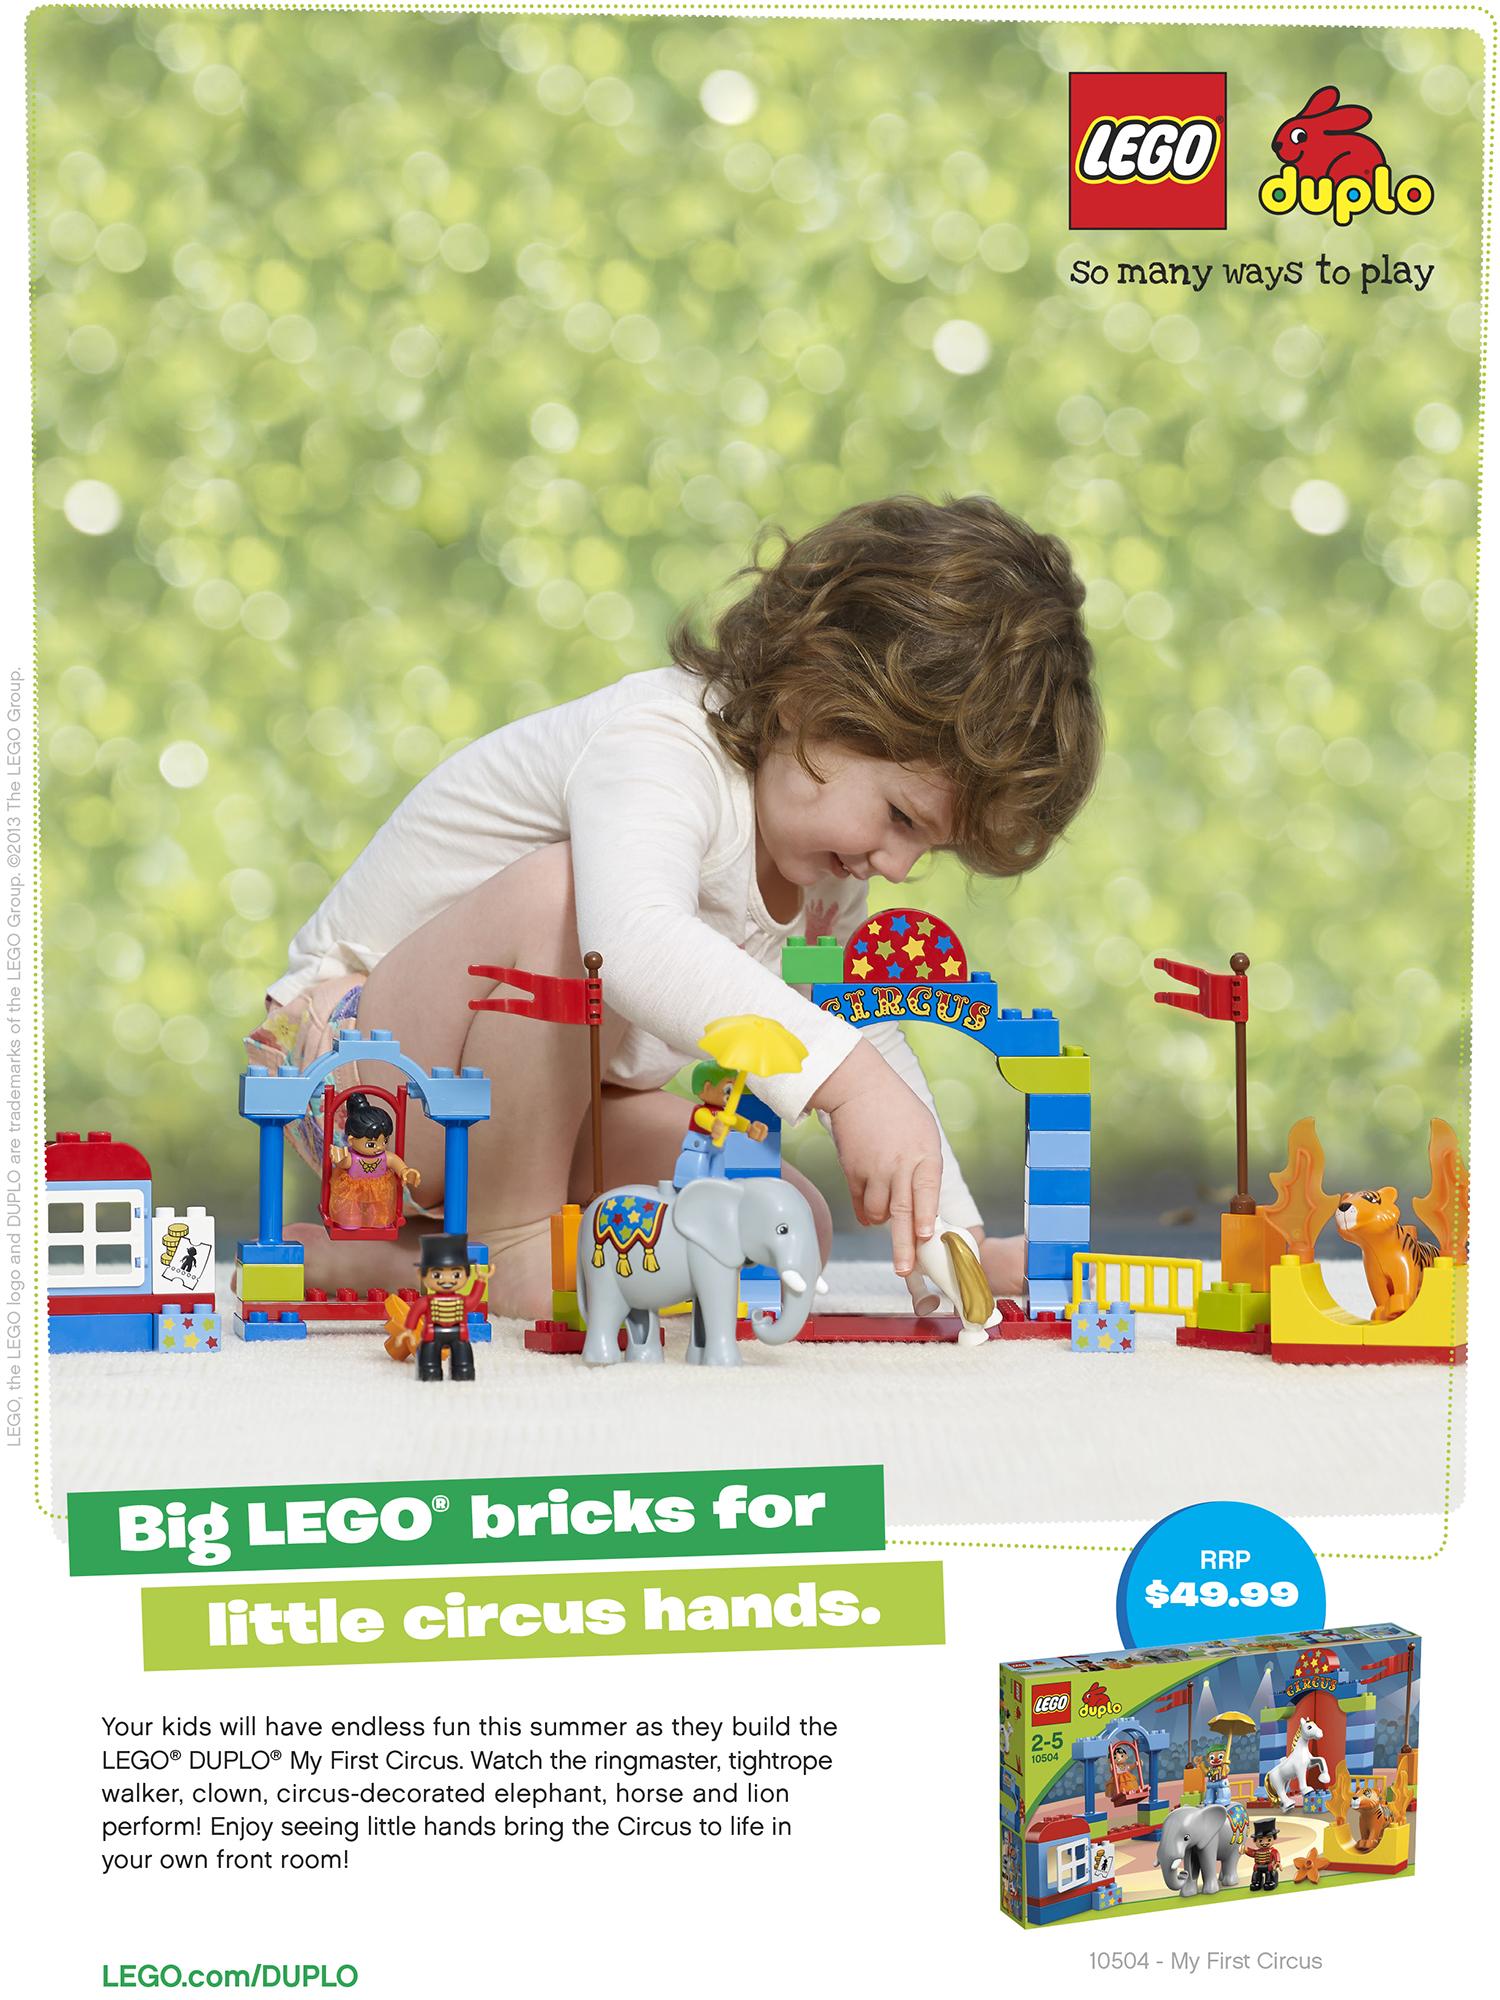 Brandee_LEGO_01.jpg